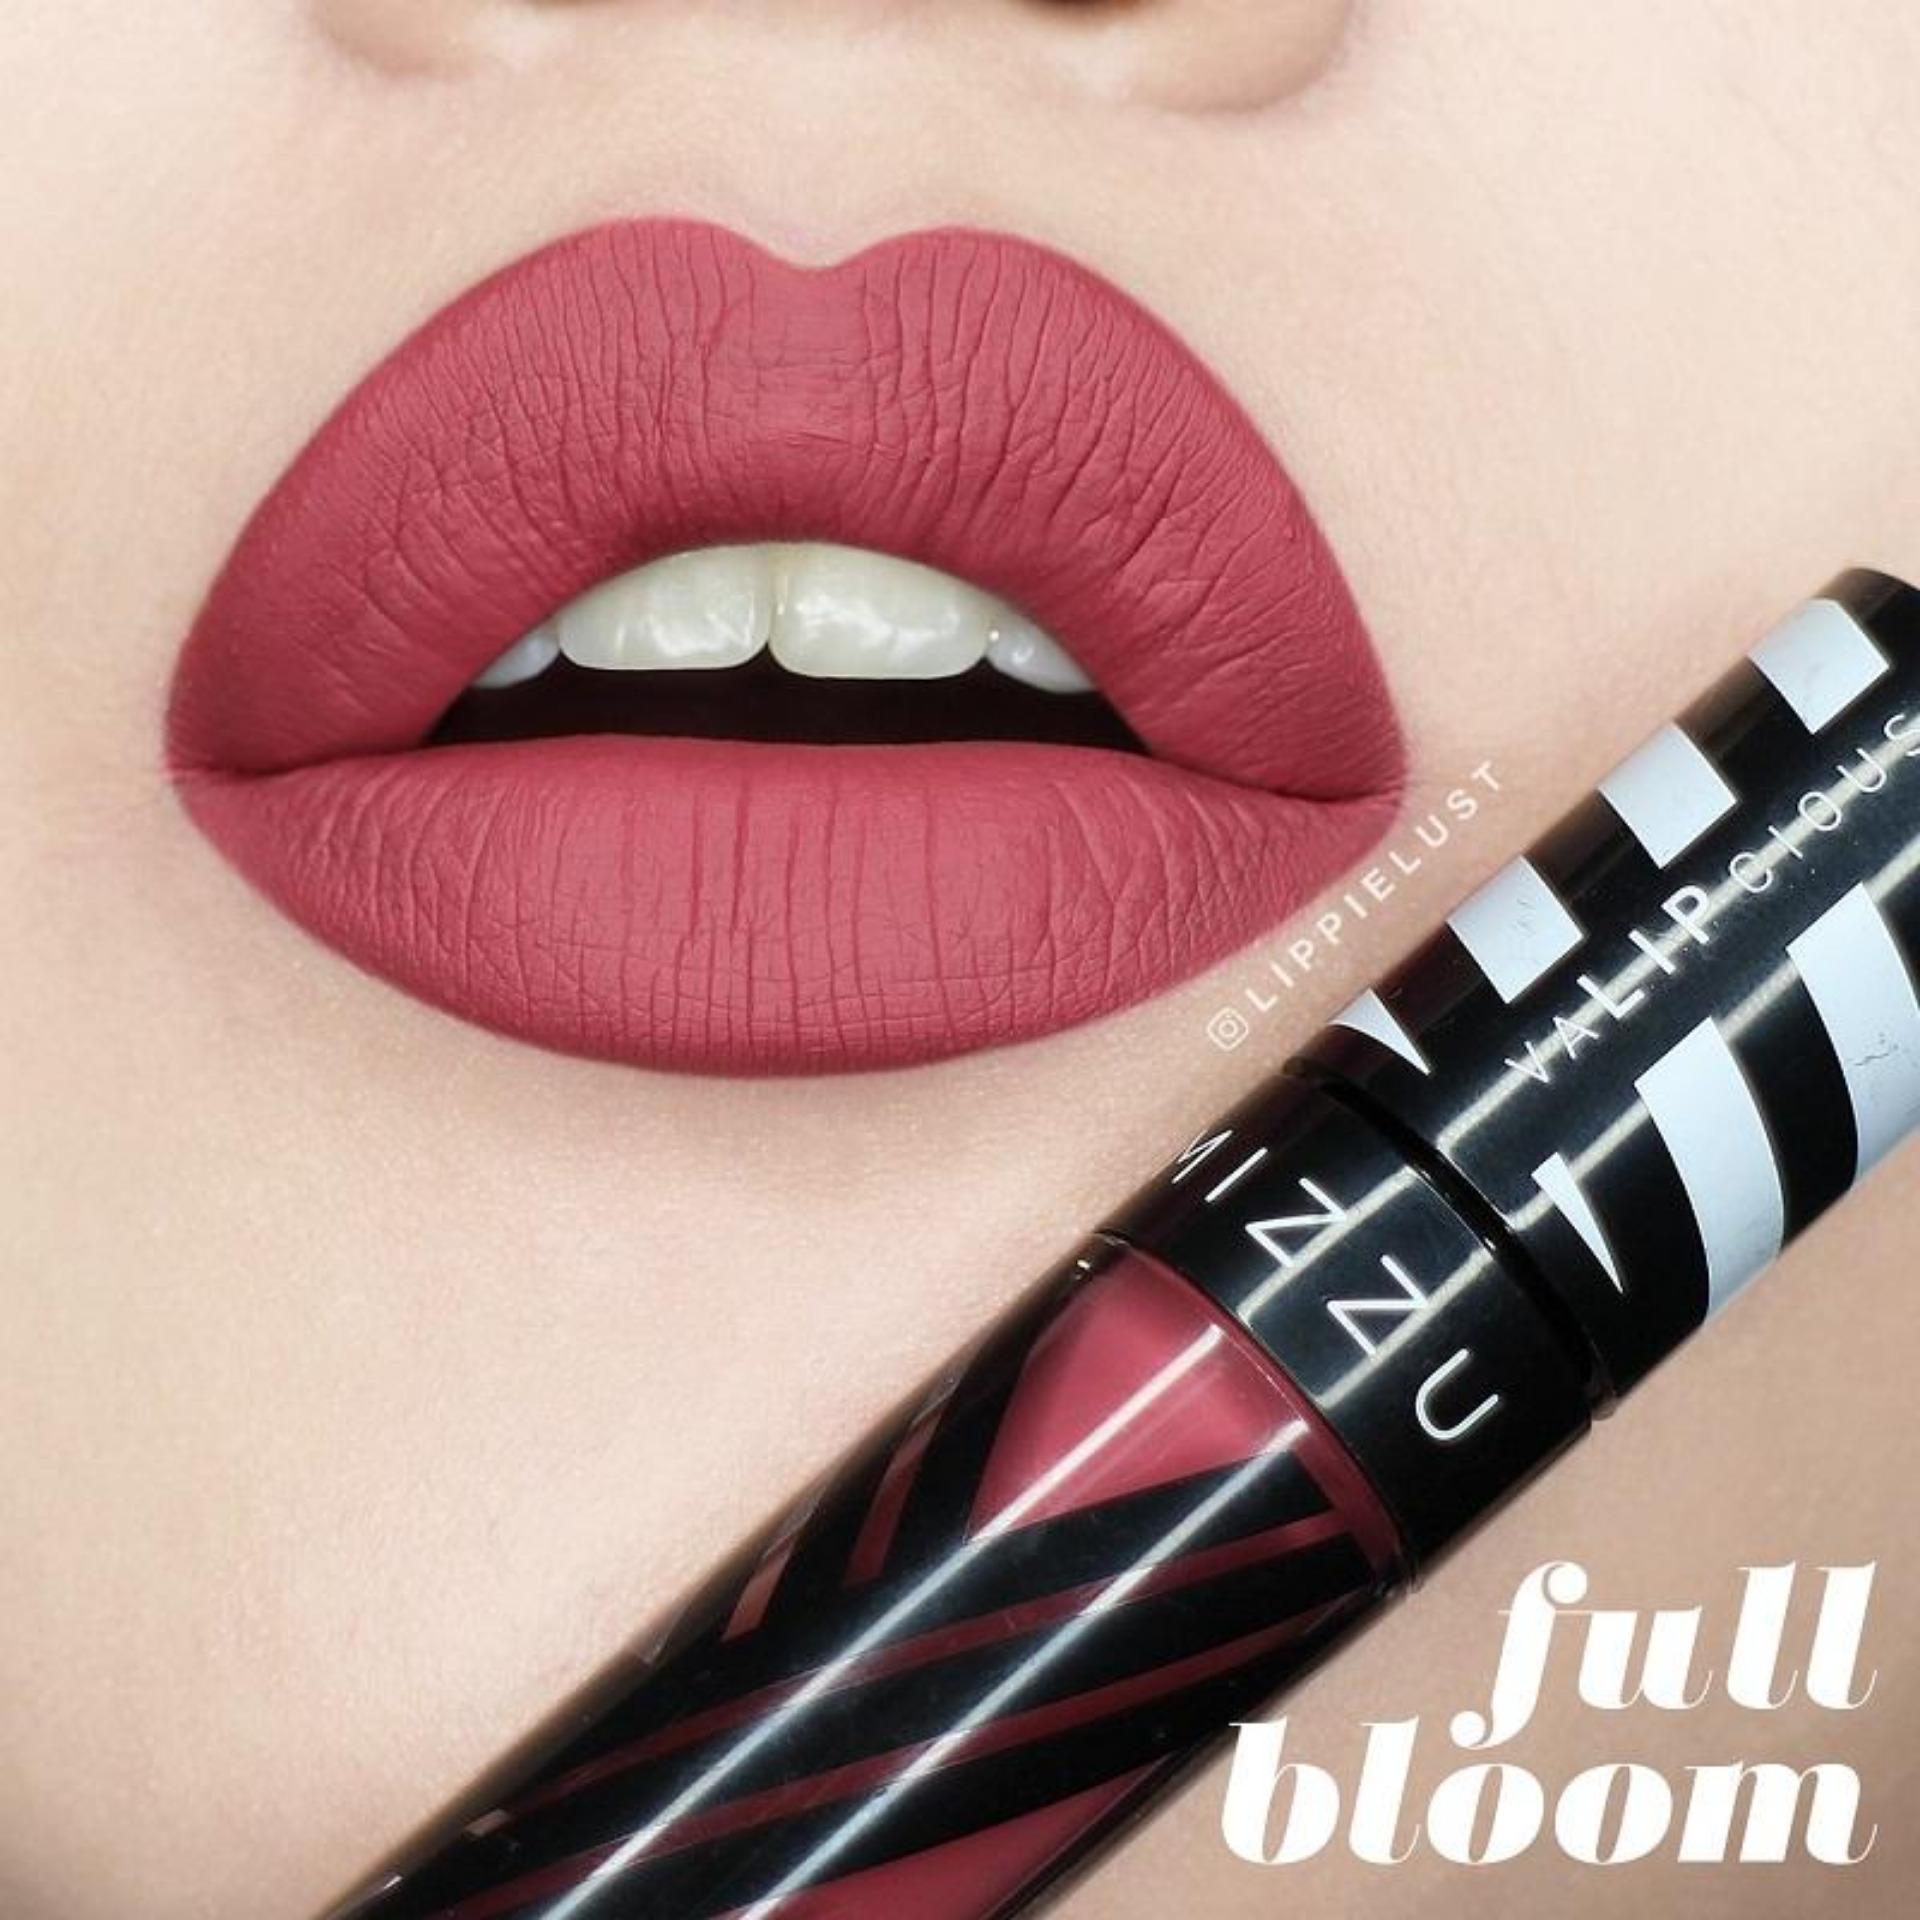 Jual Lipstik Murah Terlengkap Lipstick Matte 3ce Mood Recipe Lip Color Mini Kit Box Coklat Gift Set Kosmetik Bibir Mizzu Valipcious Velvet Full Bloom Cream